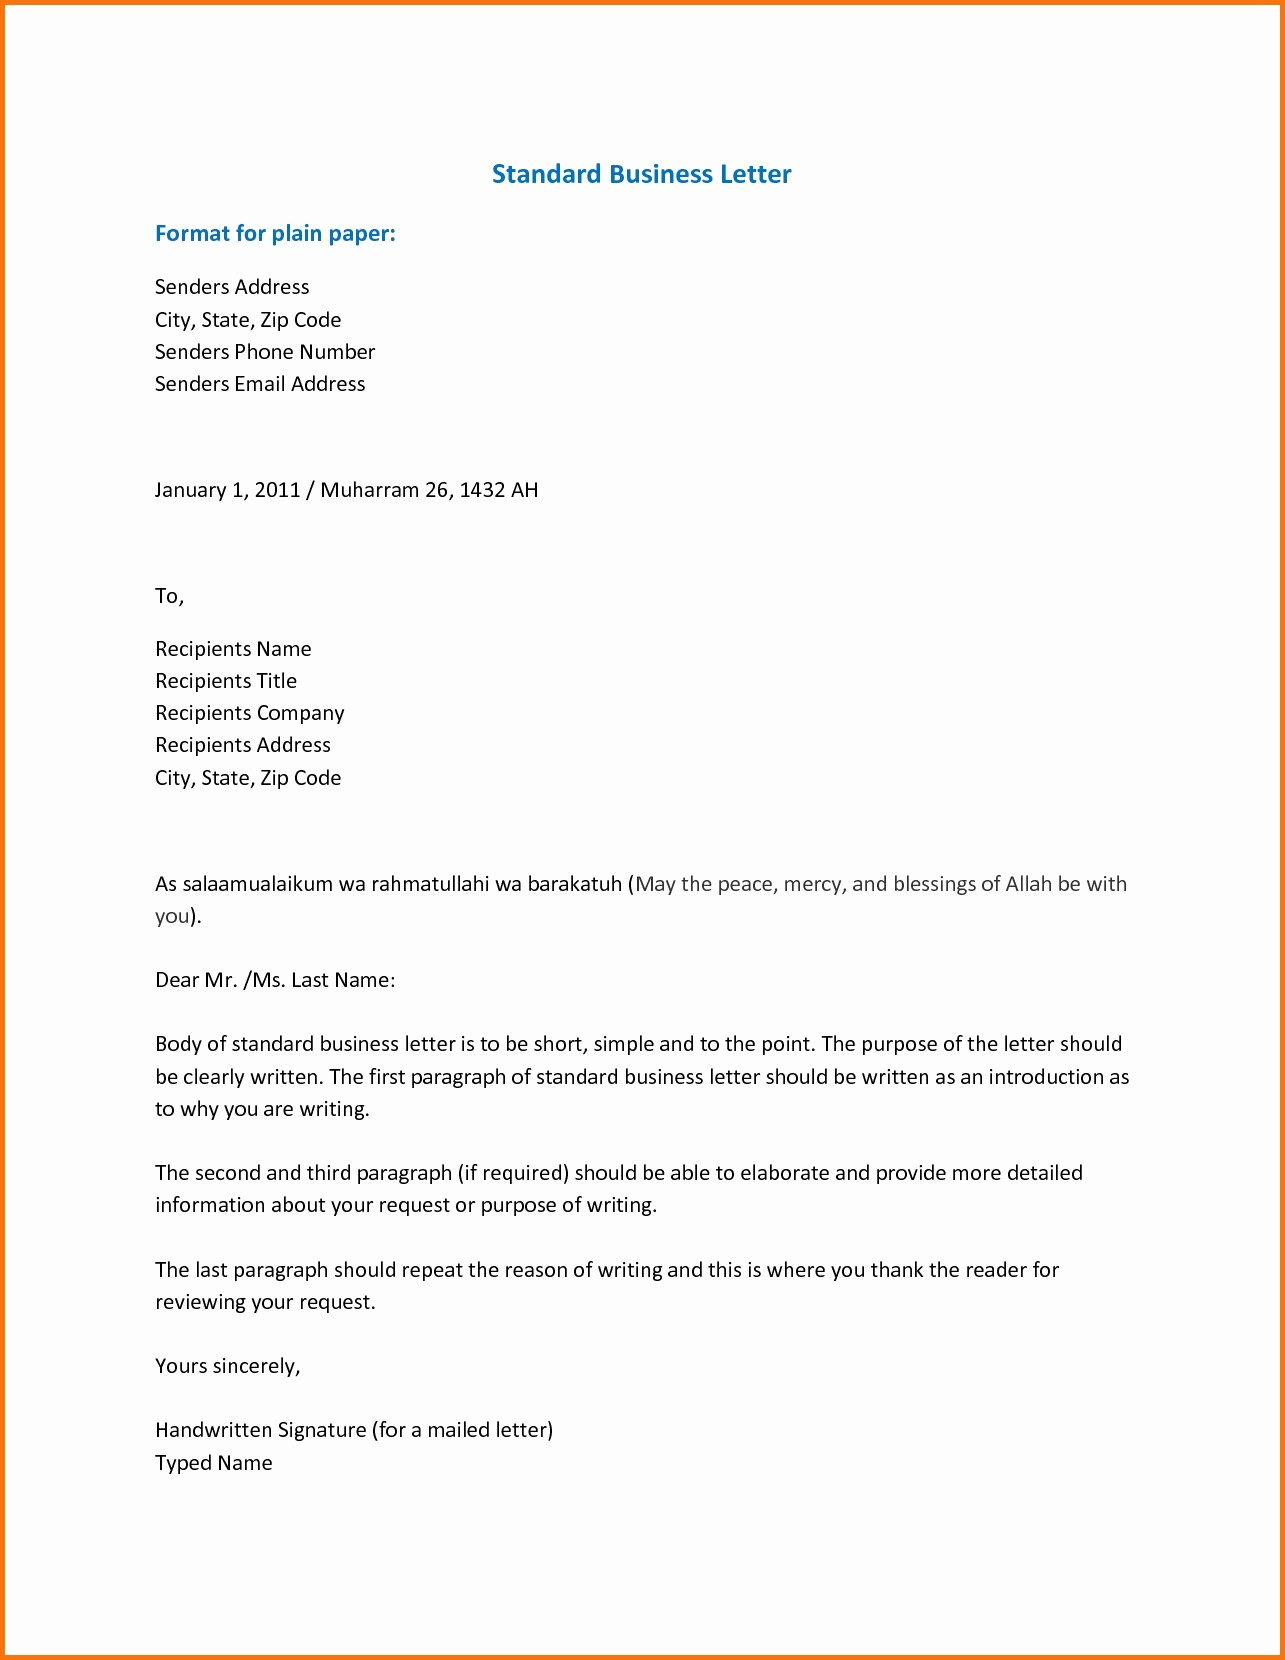 Format for formal Business Letter Awesome Standard Letter format